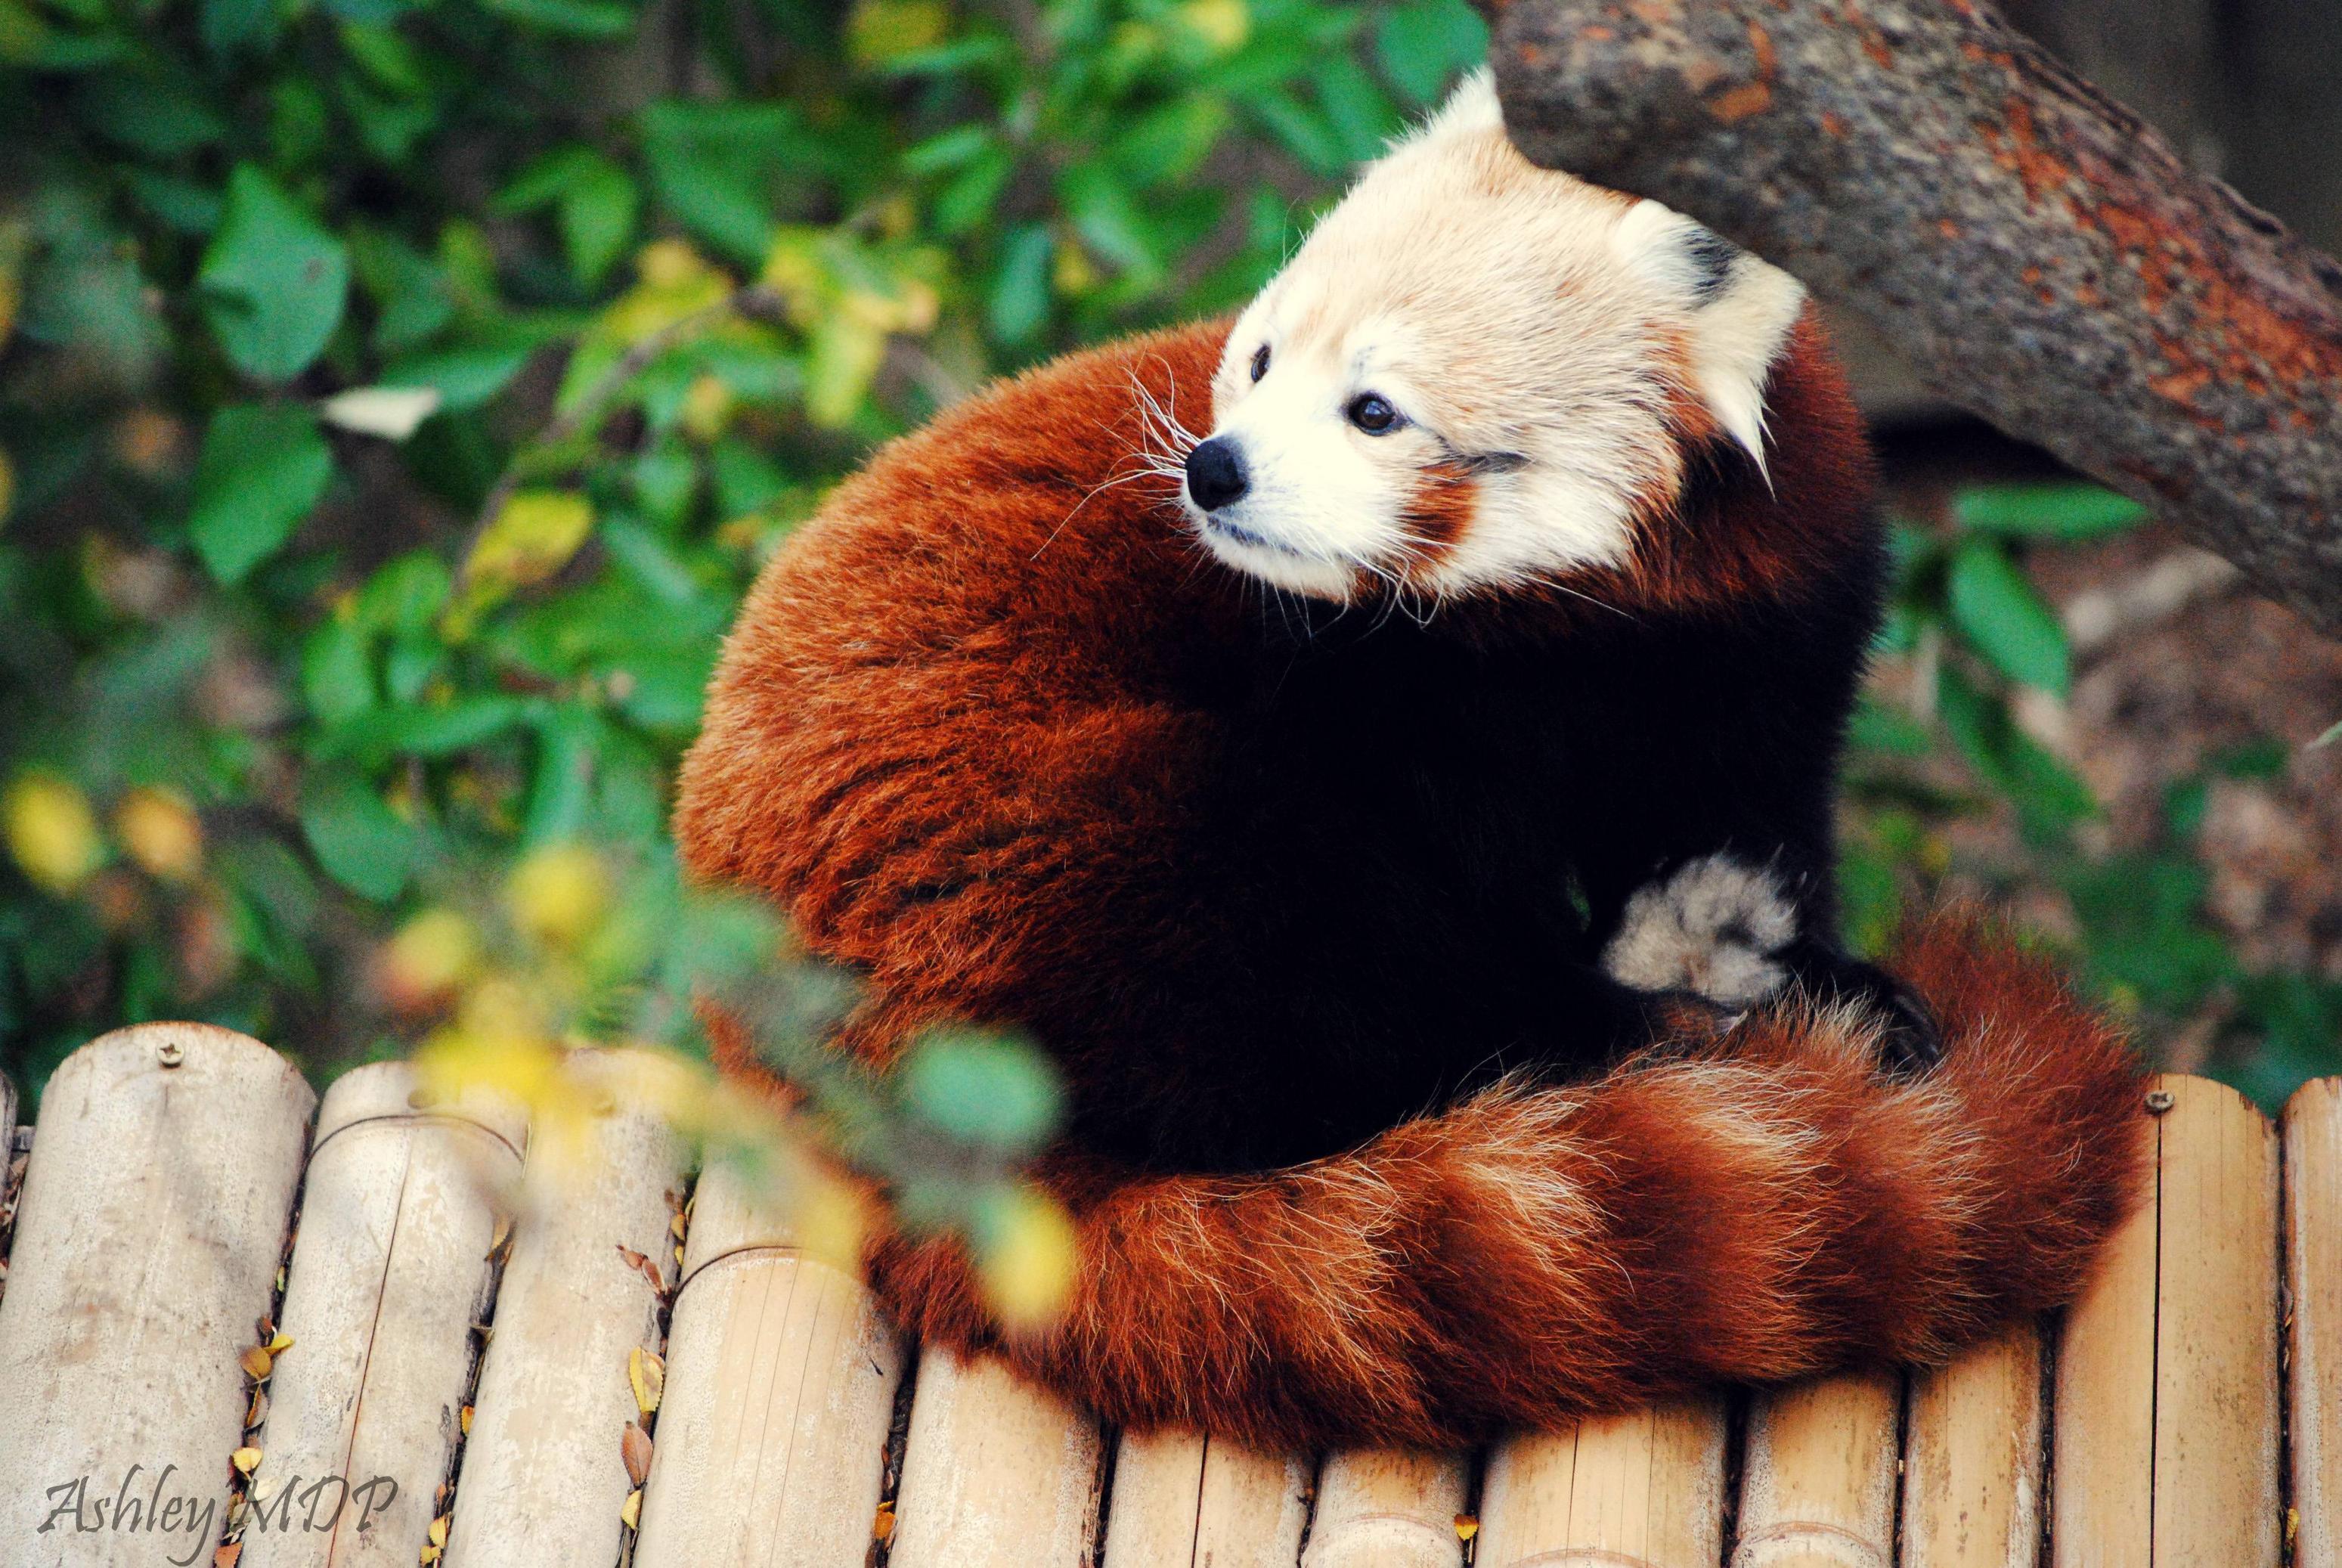 Red Panda Wallpapers - Wallpaper Cave | 3098 x 2074 jpeg 936kB